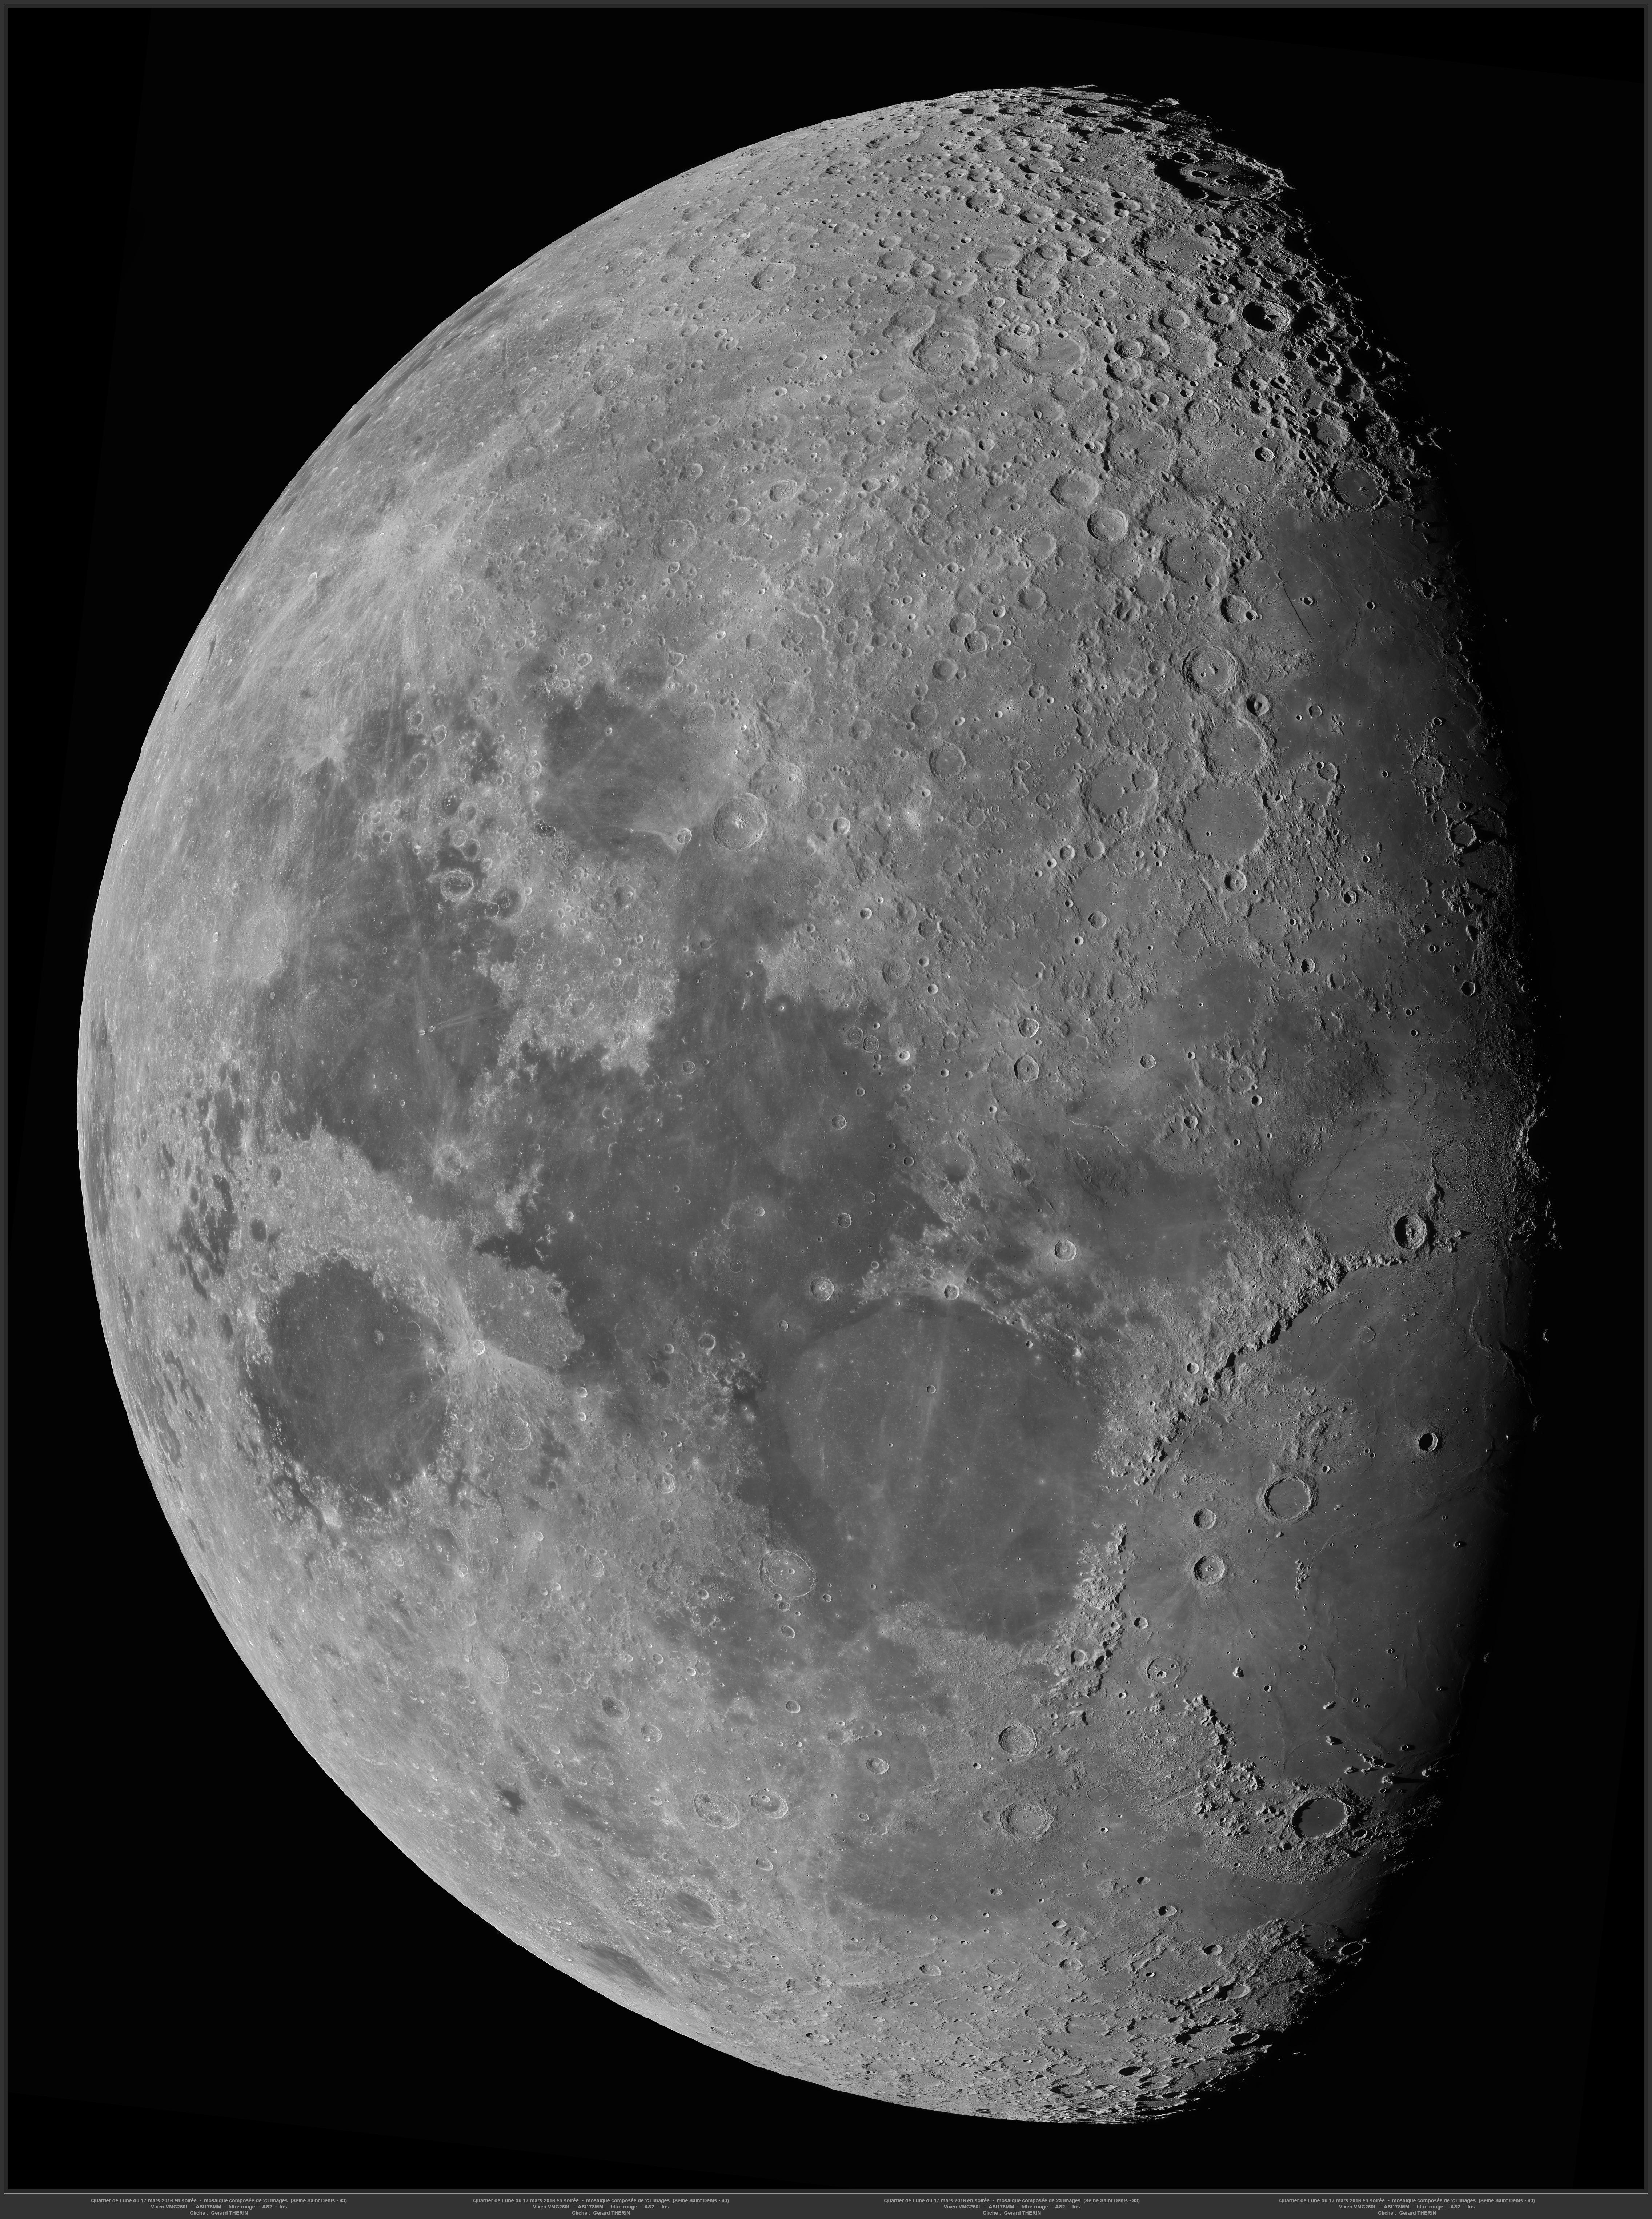 2016-03-17_lune-gibbeuse_vmc260_asi178mm_r_as2_iris_cc_23img_6000_copyright.jpg